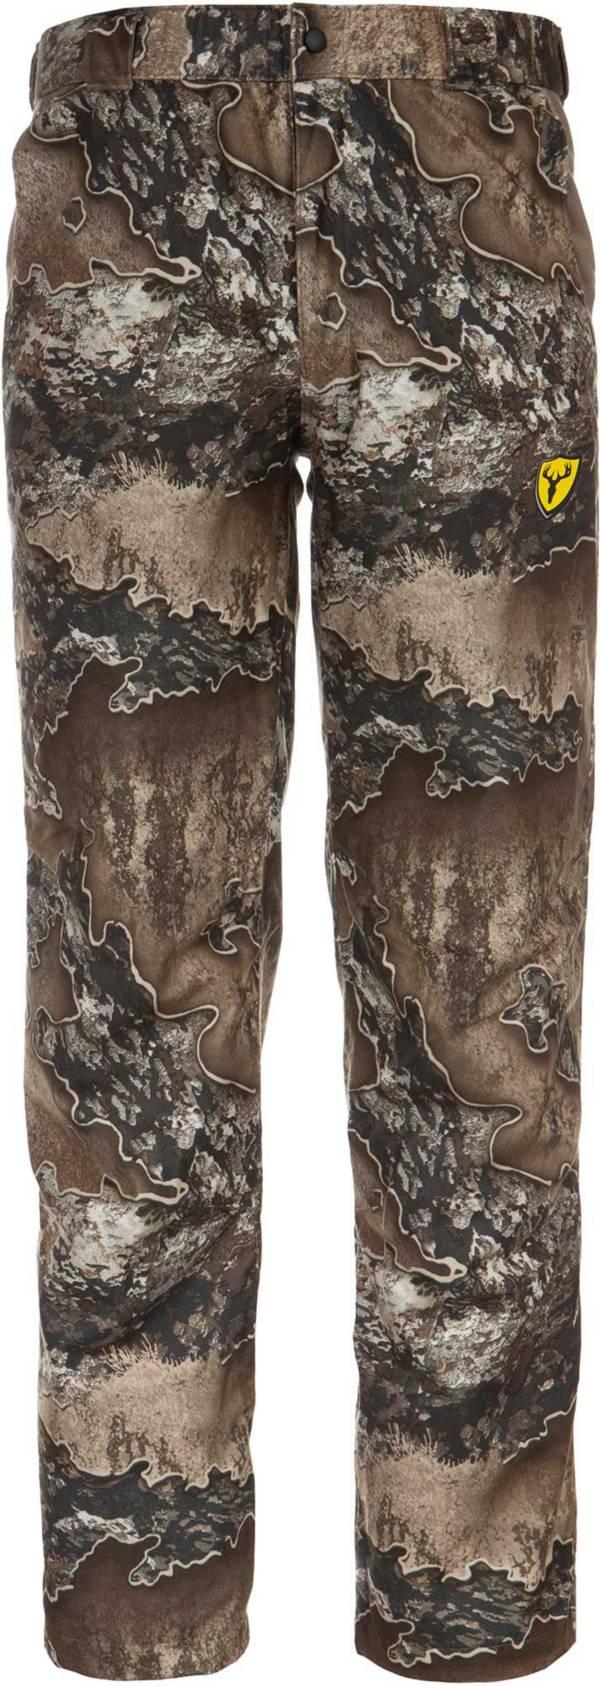 Blocker Outdoors Men's Drencher Pants product image